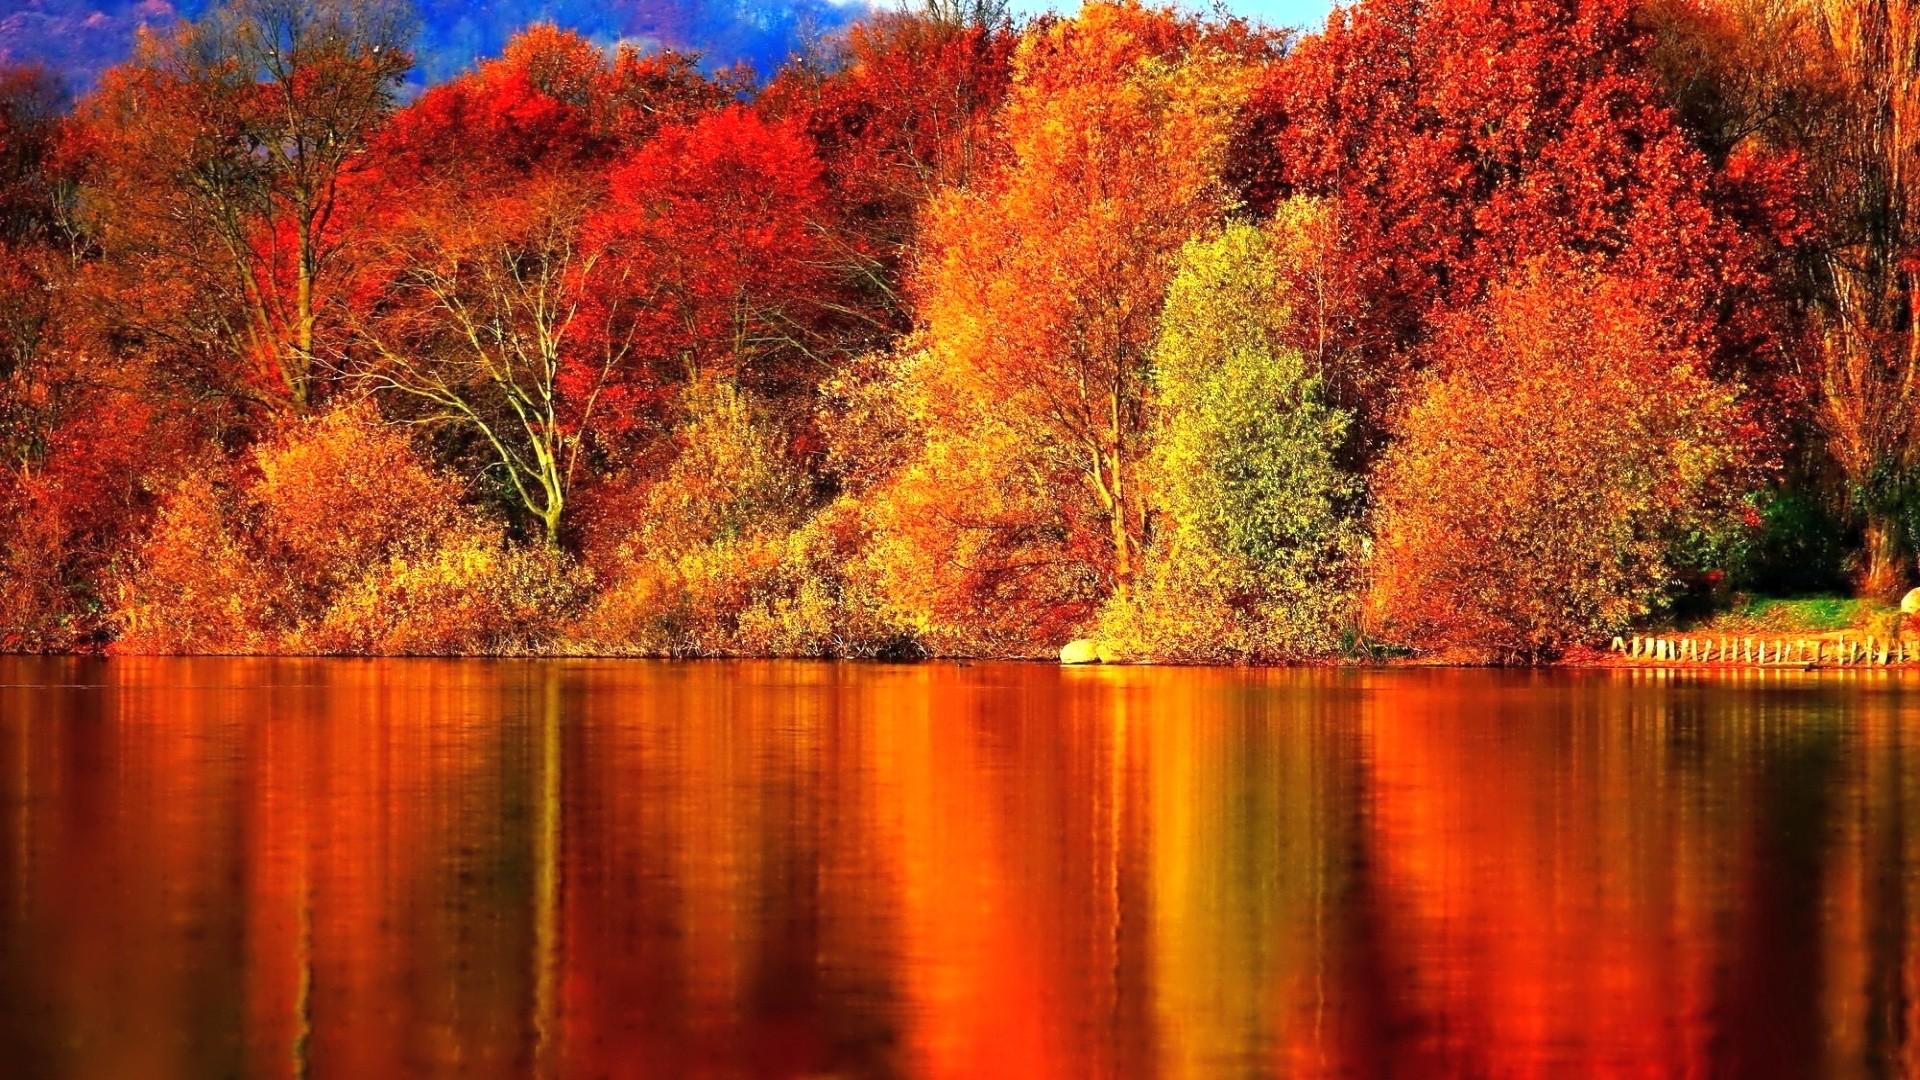 Fall Wallpaper Hd 1920x1080 63 Images